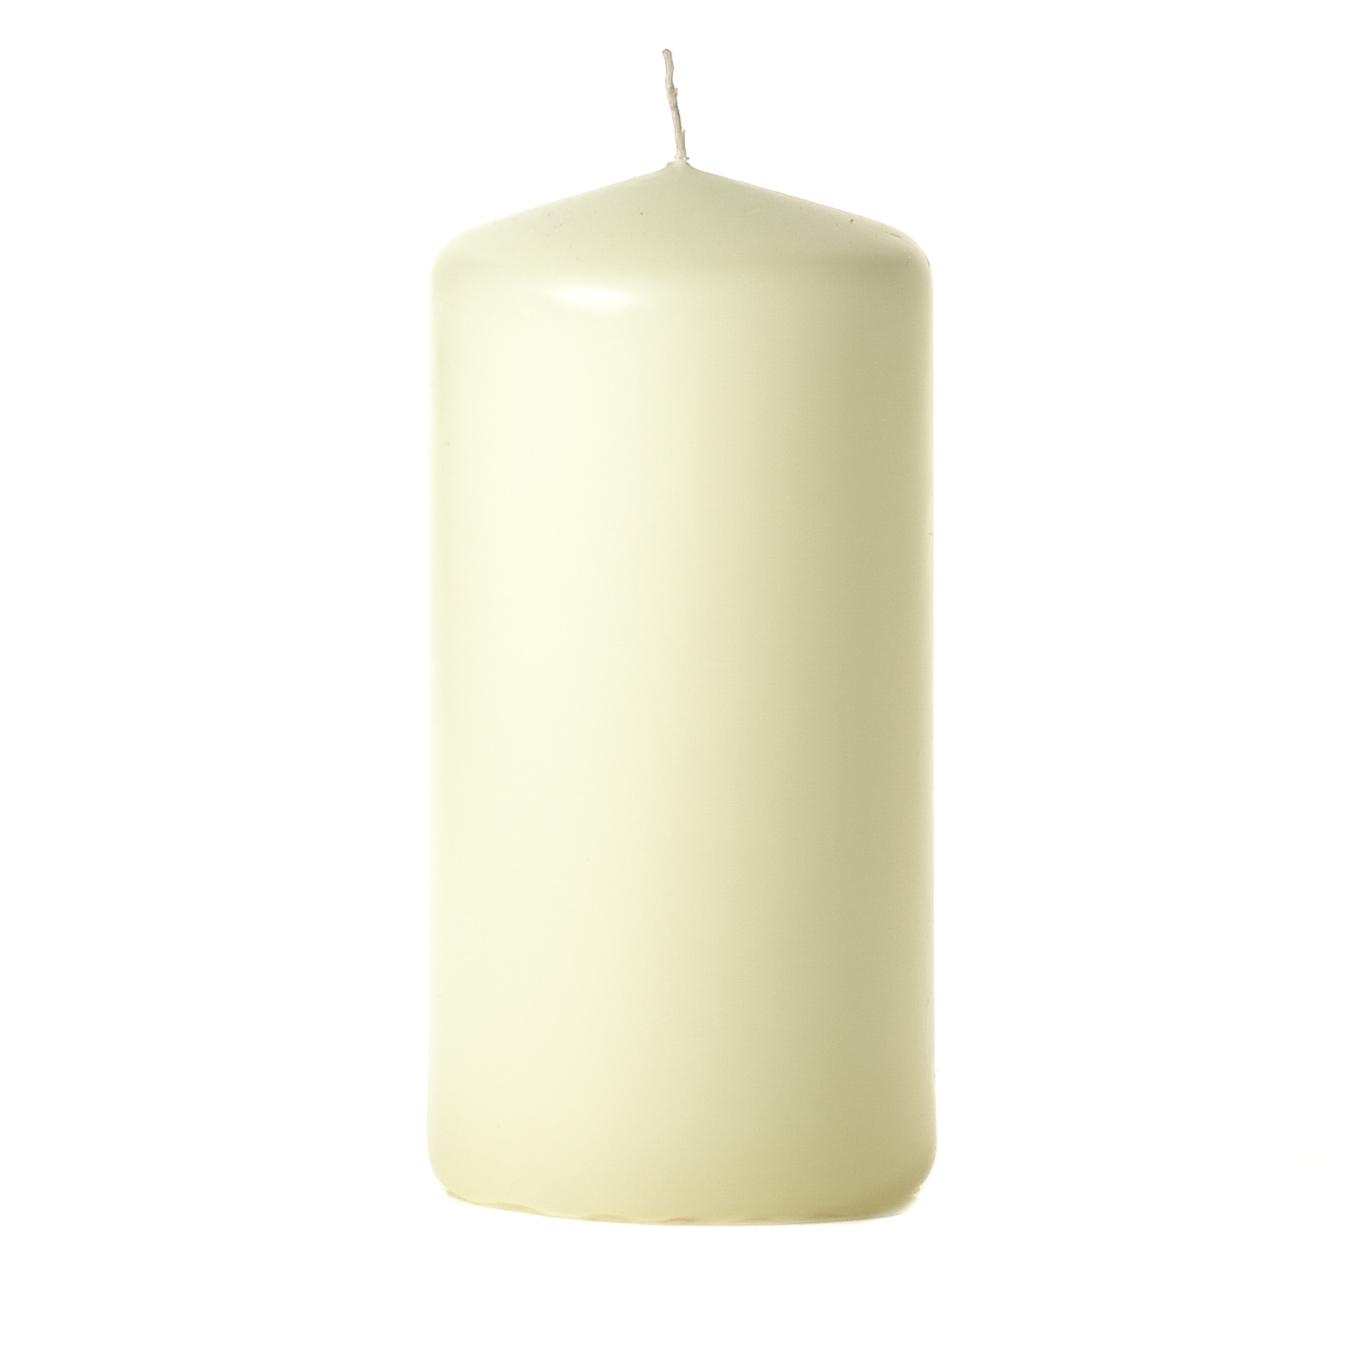 3x6 Ivory Pillar Candles Unscented